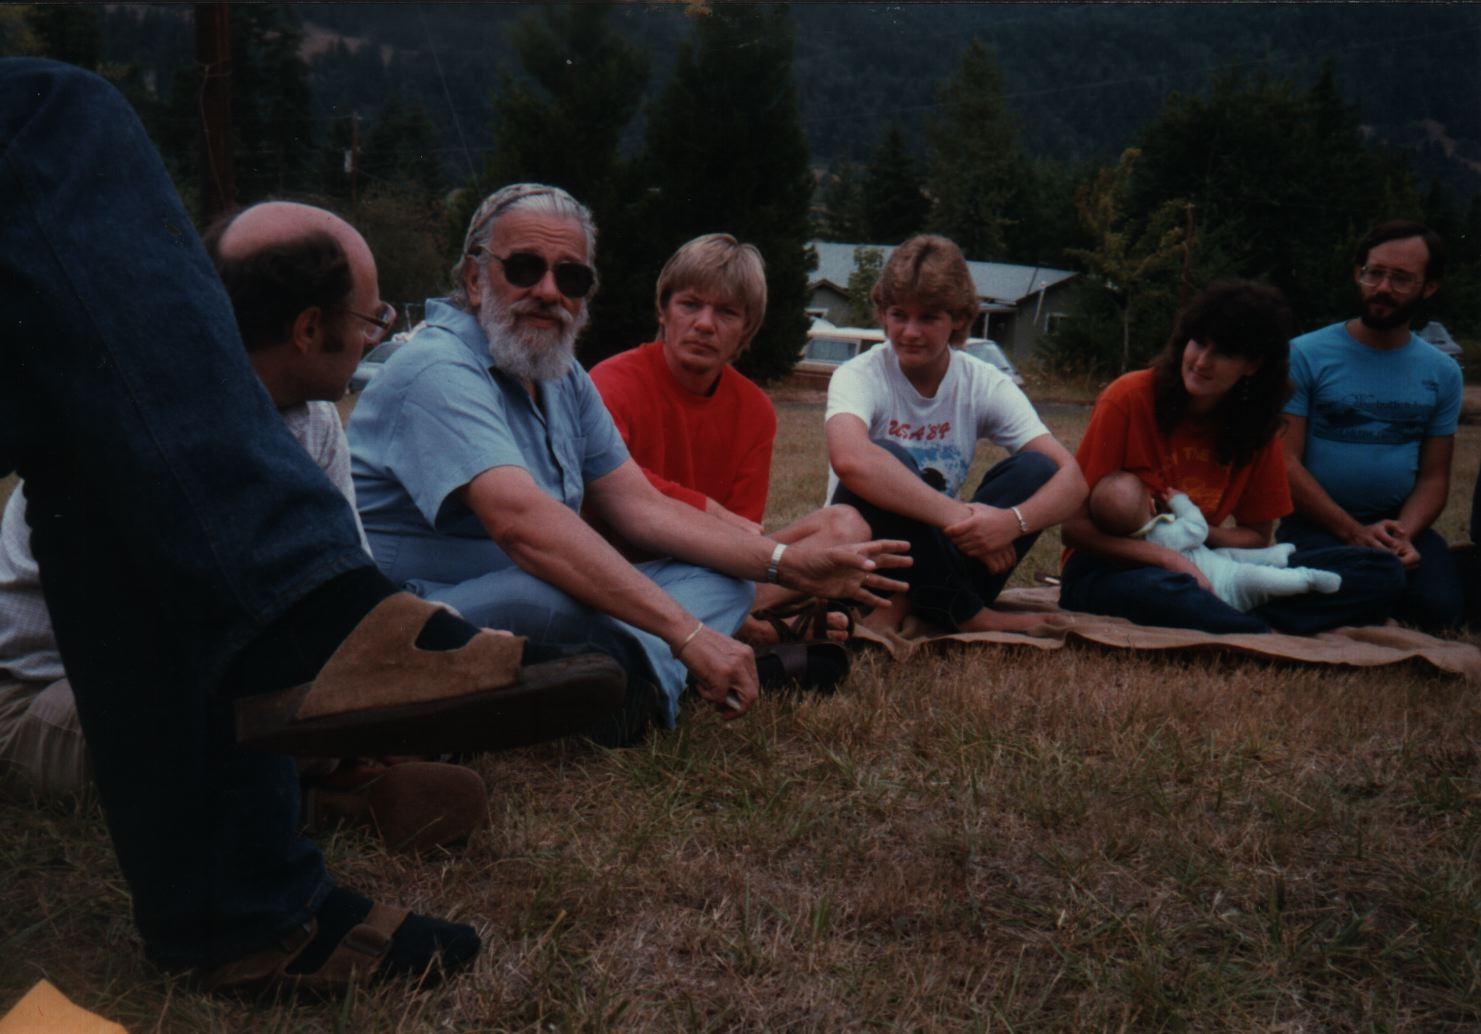 85 Joys  Zalman Schachter-Shalomi teaching, listening are Keith Whithaker (legs and sandals), Jerry Diller, Rudi Haas, ?Kathy Koroz?, Sue Henkin with baby Sasha, Malvin Finklestein copy.jpg